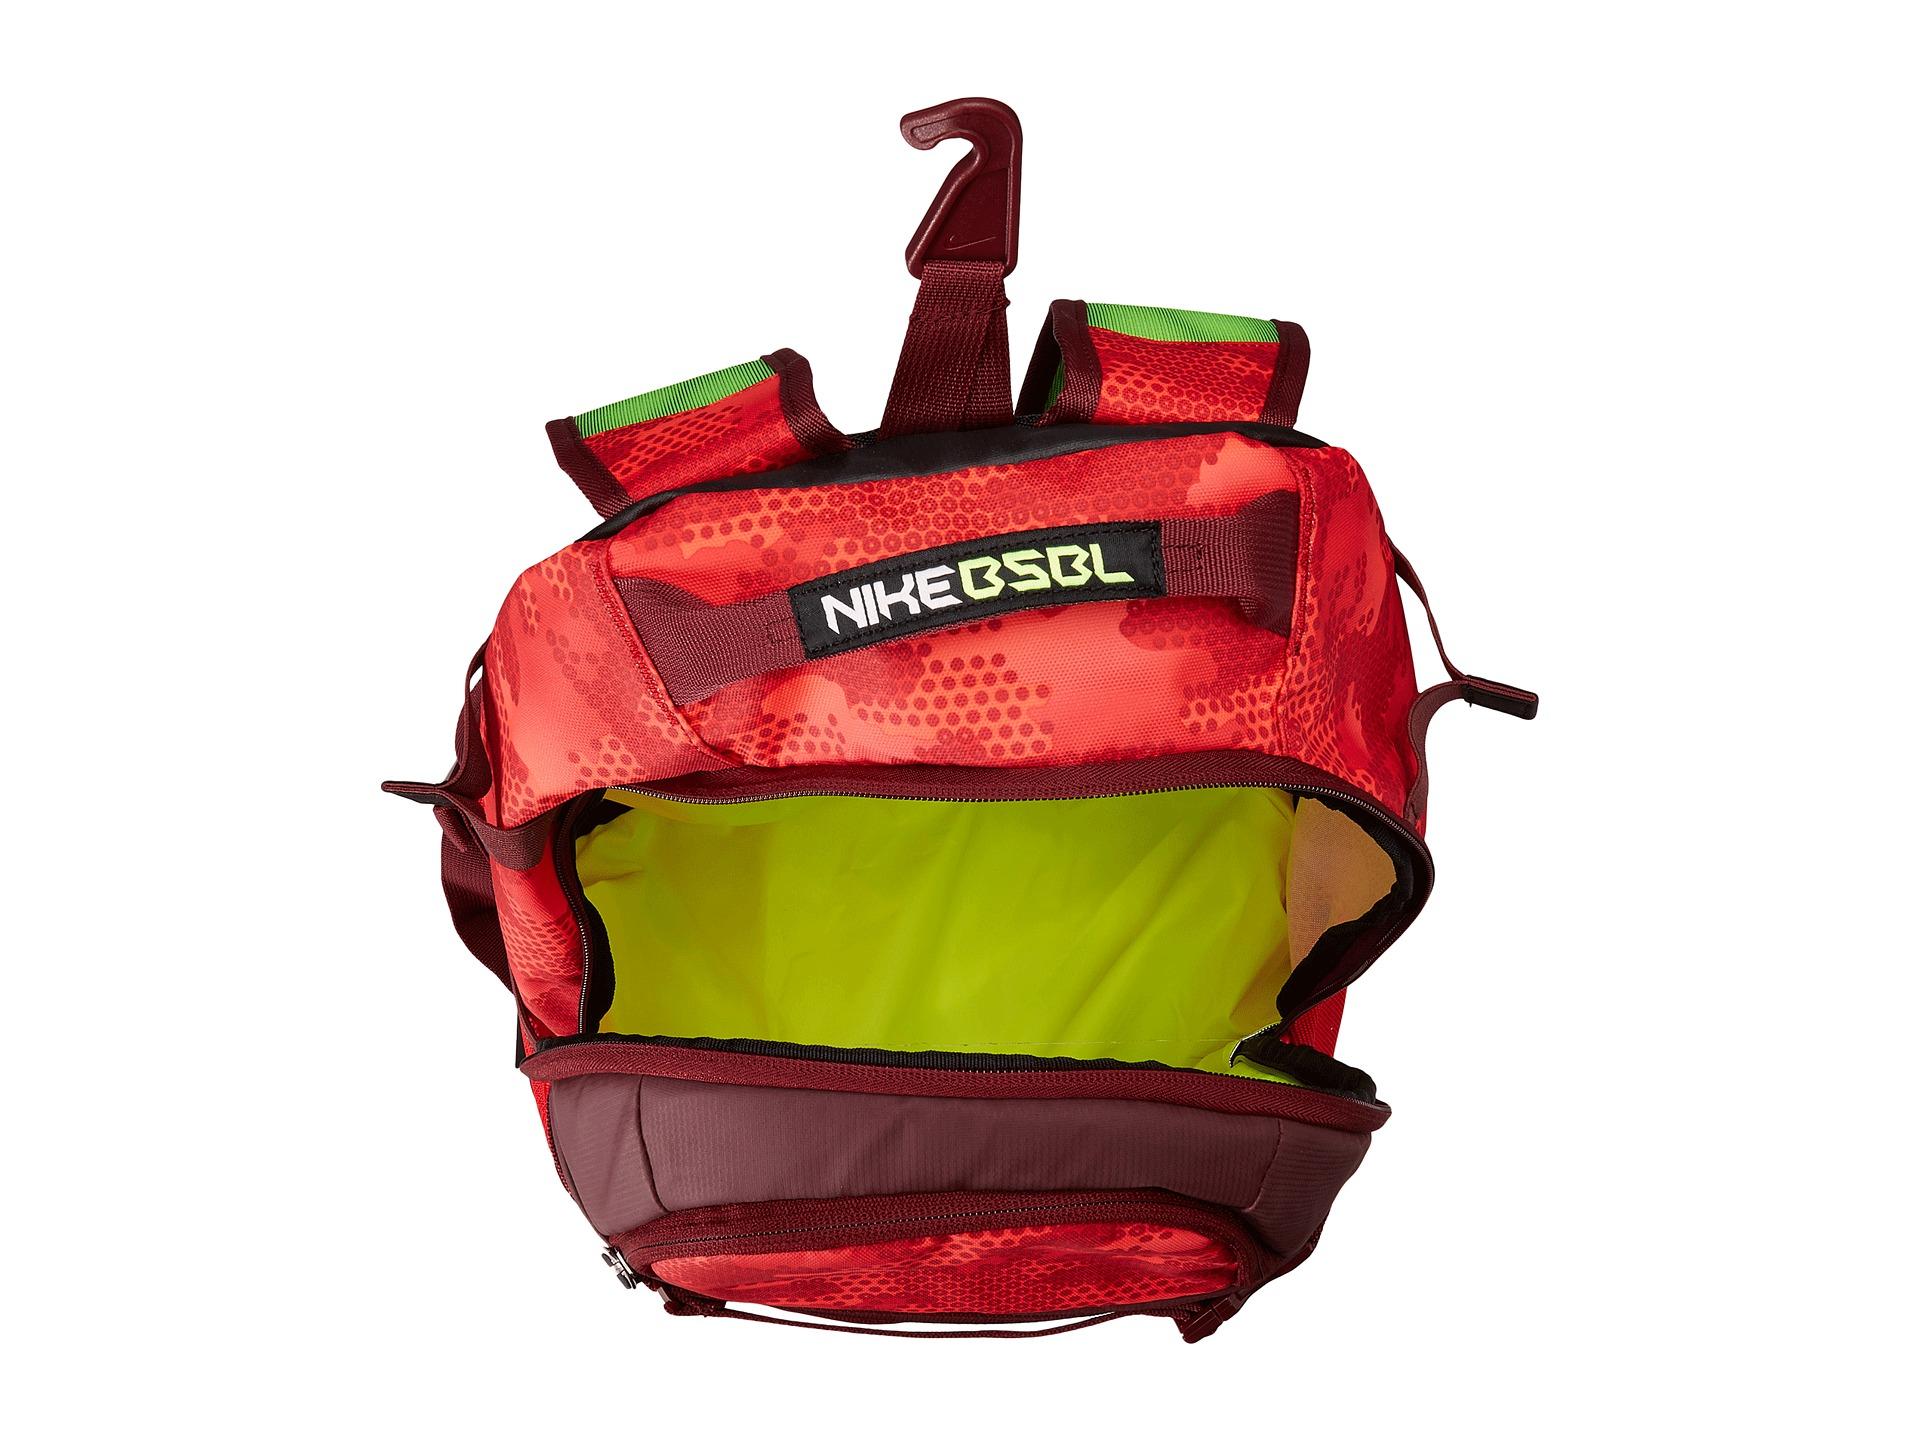 Lyst - Nike Vapor Elite Bat Backpack Graphic in Red for Men 91b570a6c87f9